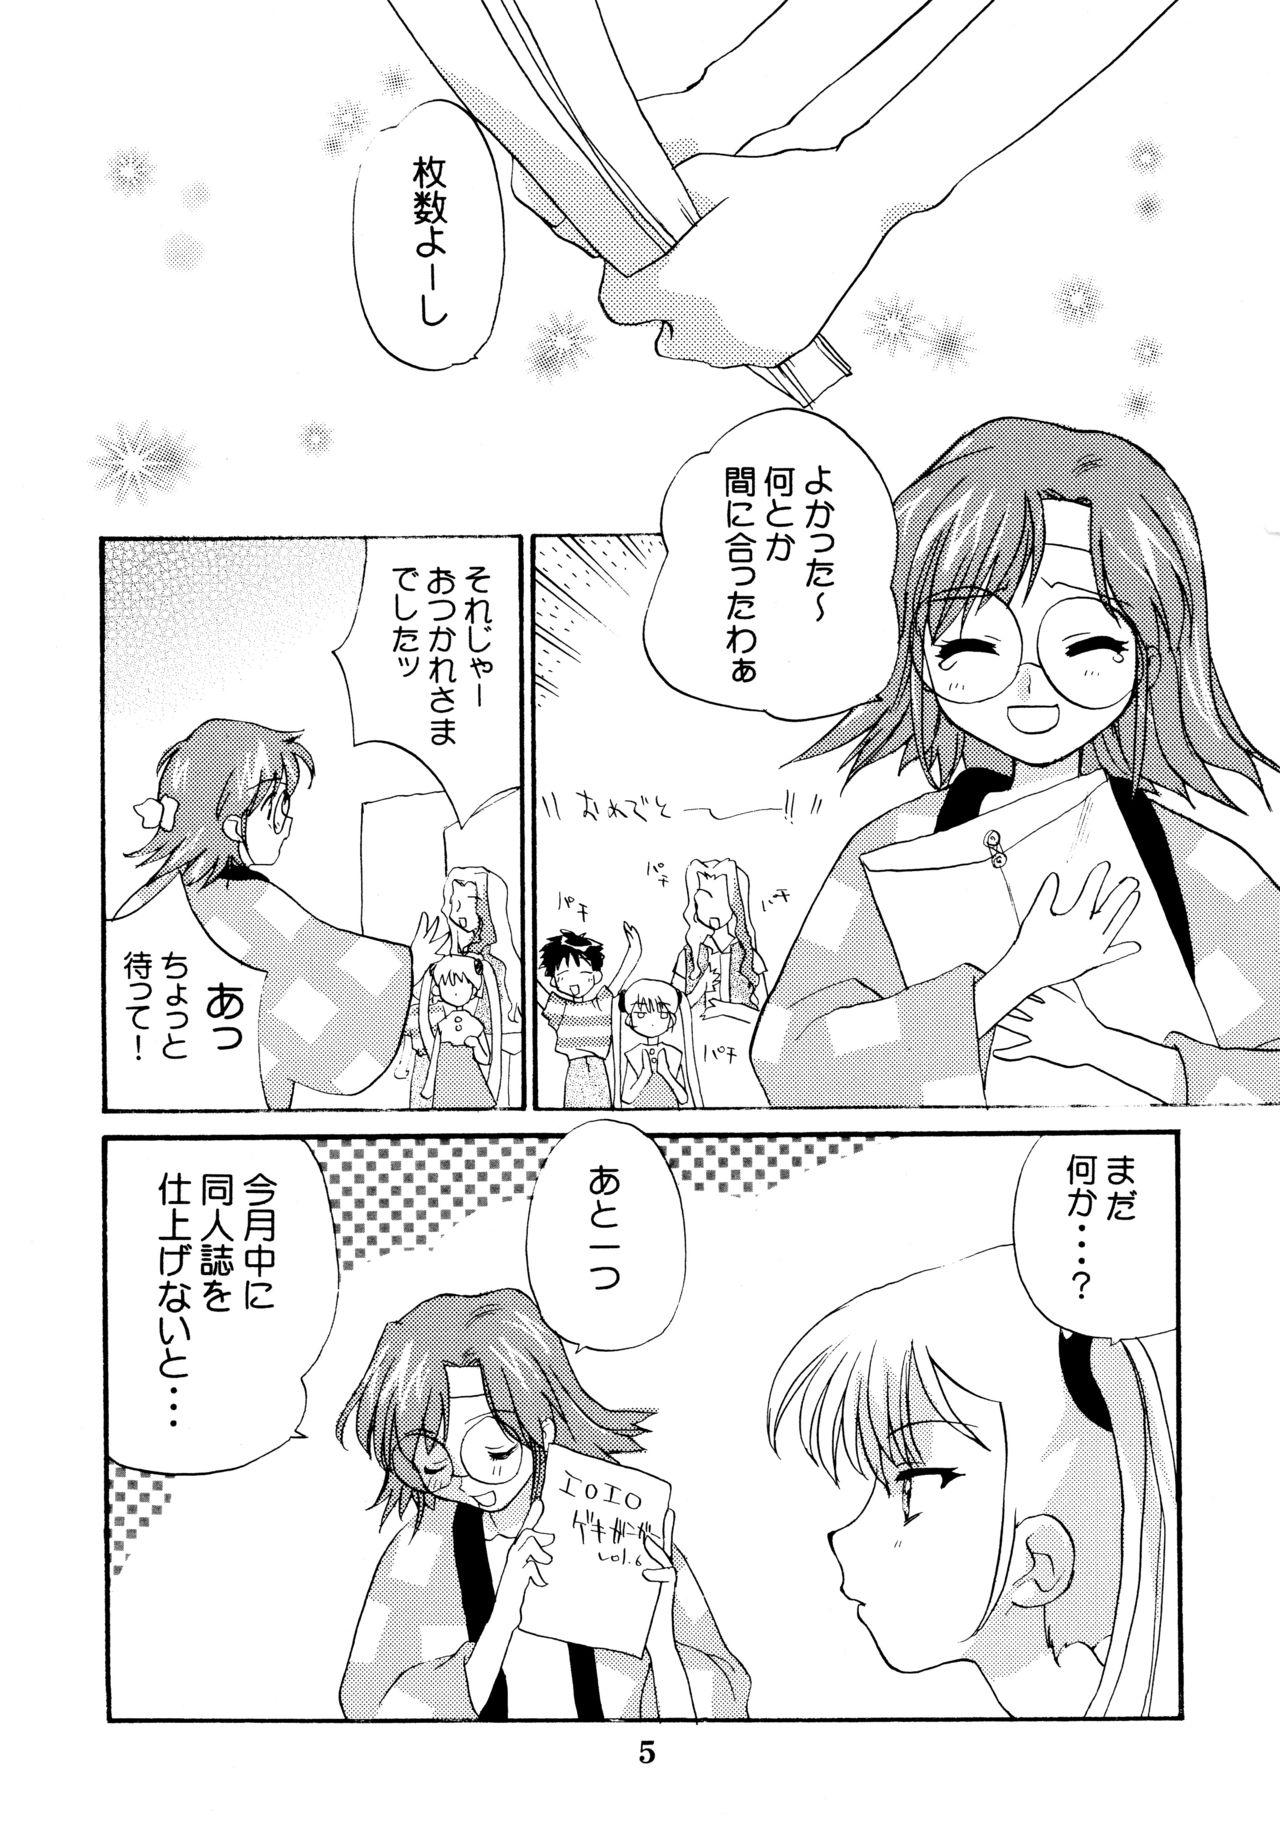 Yousei no Haoto 4